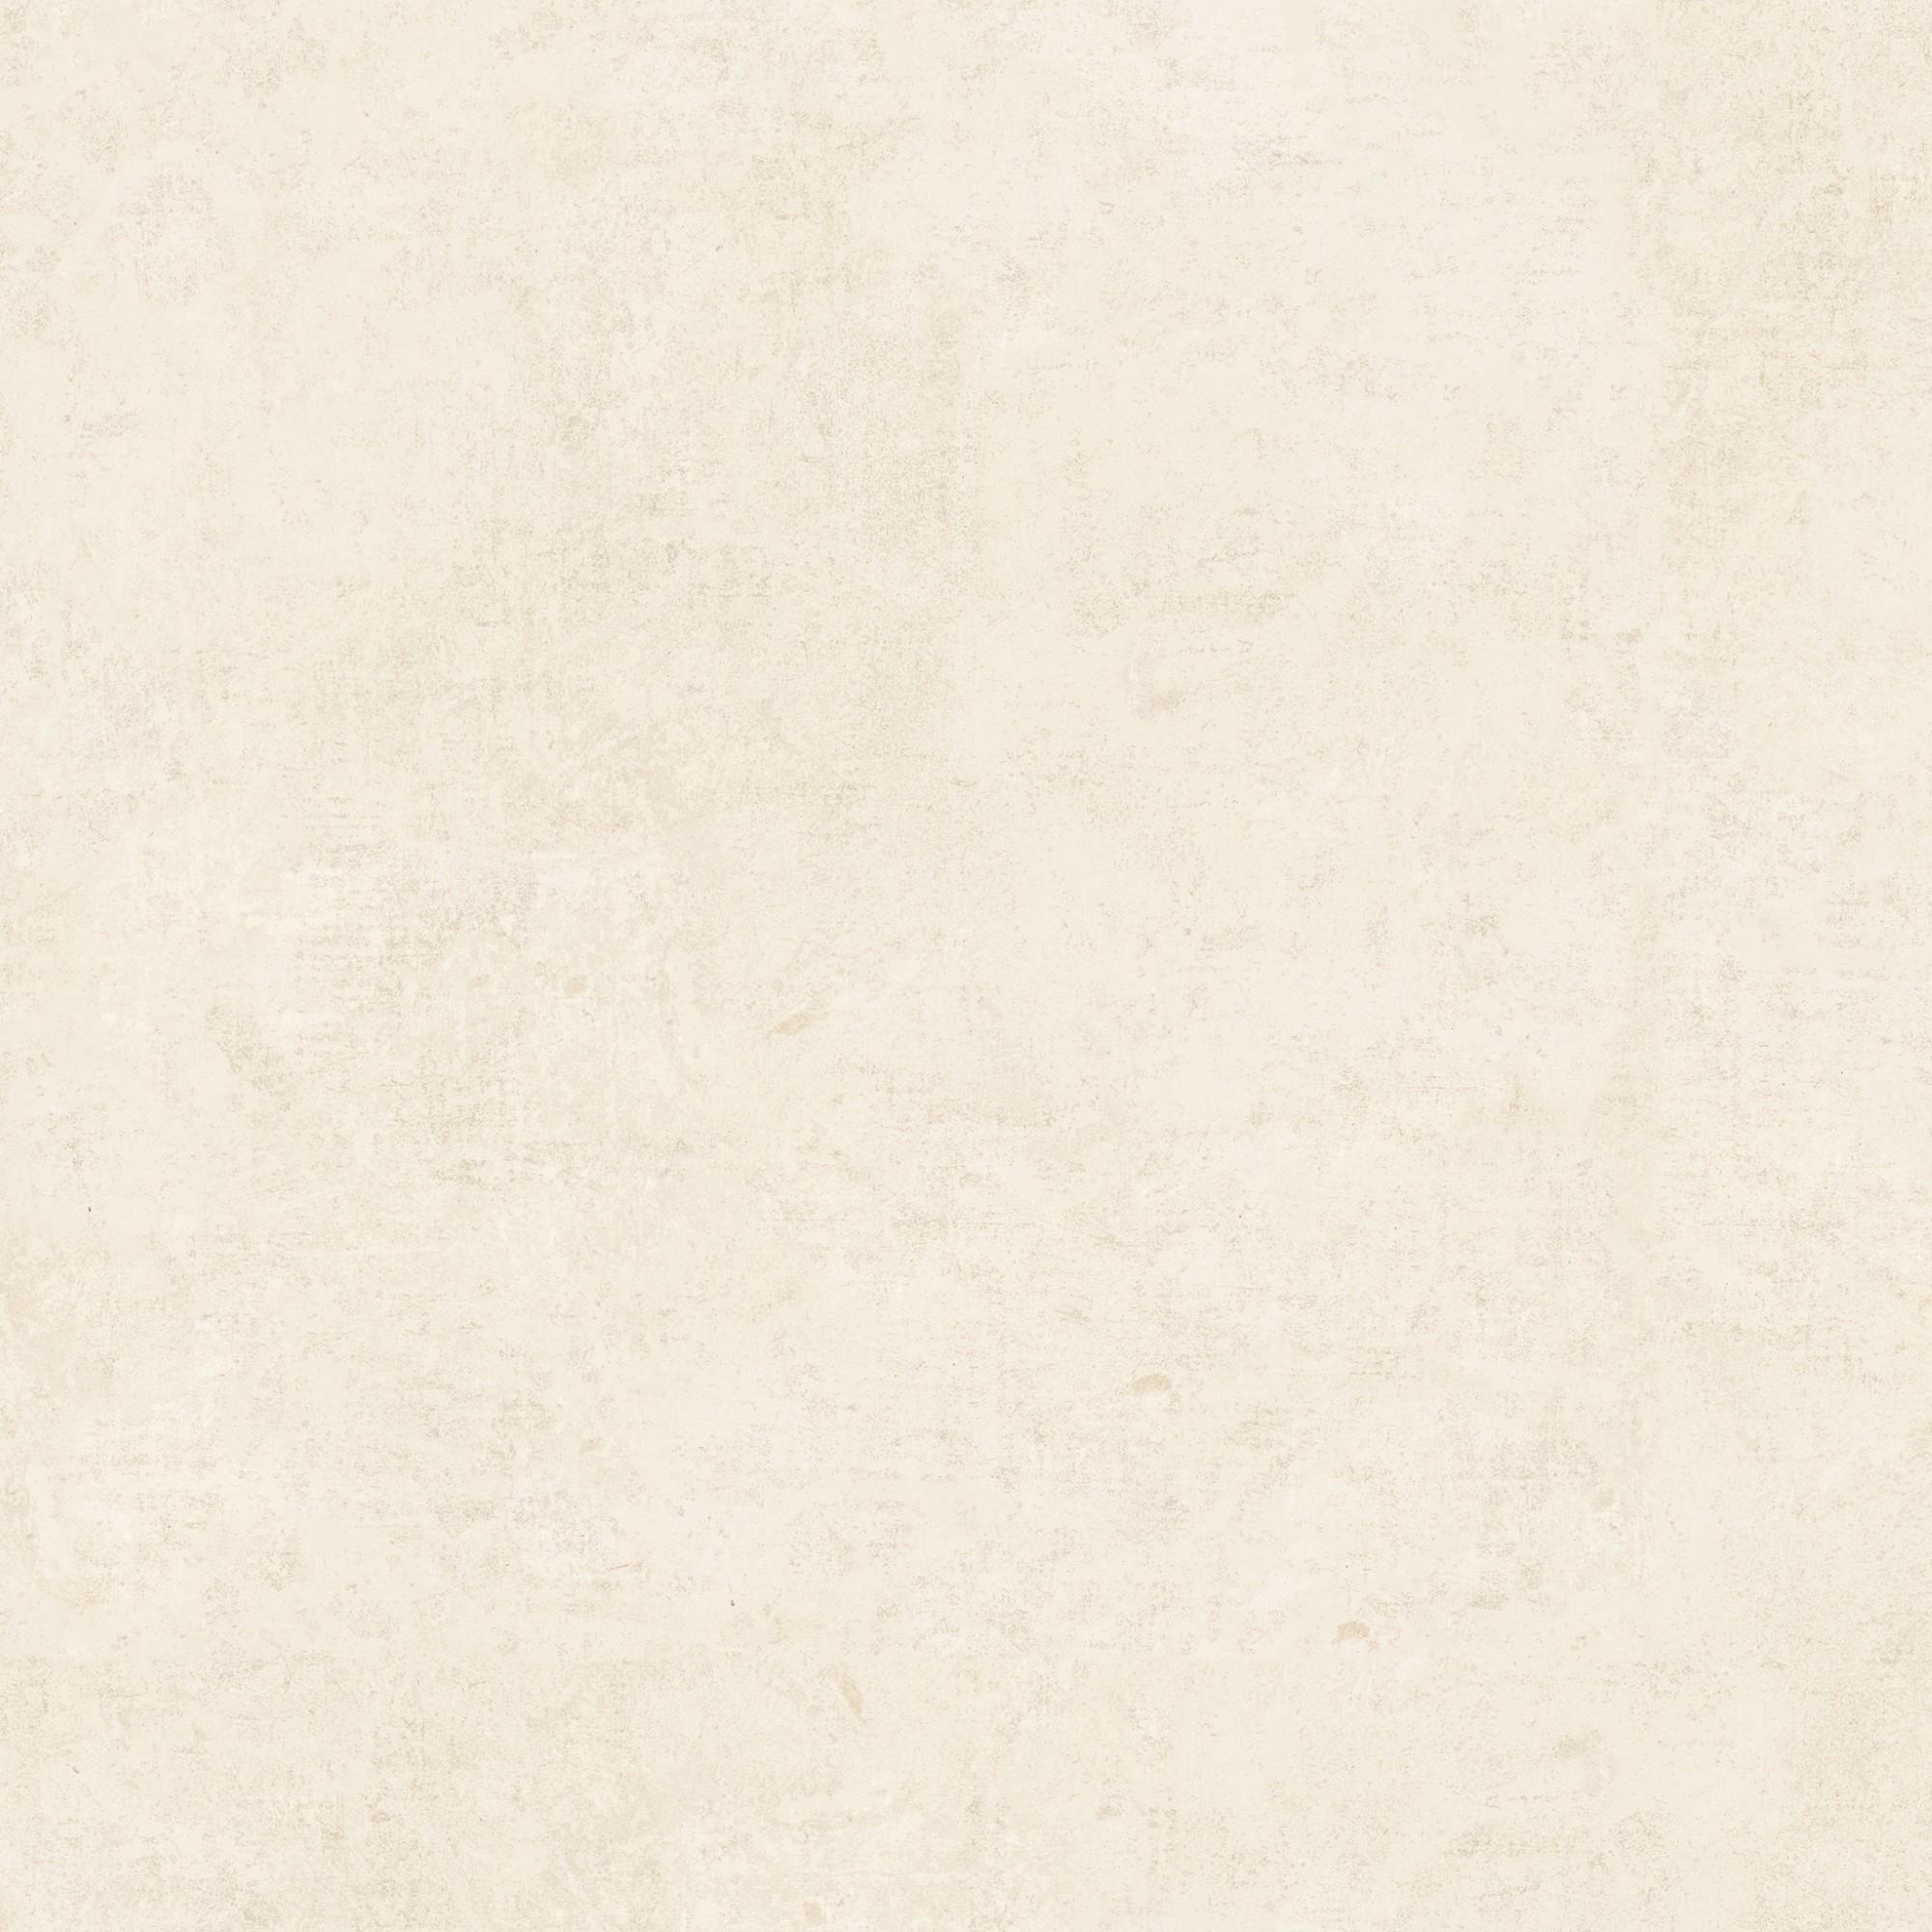 Ceramica Tipo A 62x62 cm Palmi Plus Esmaltado Brilhante 232m - Carmelo Fior